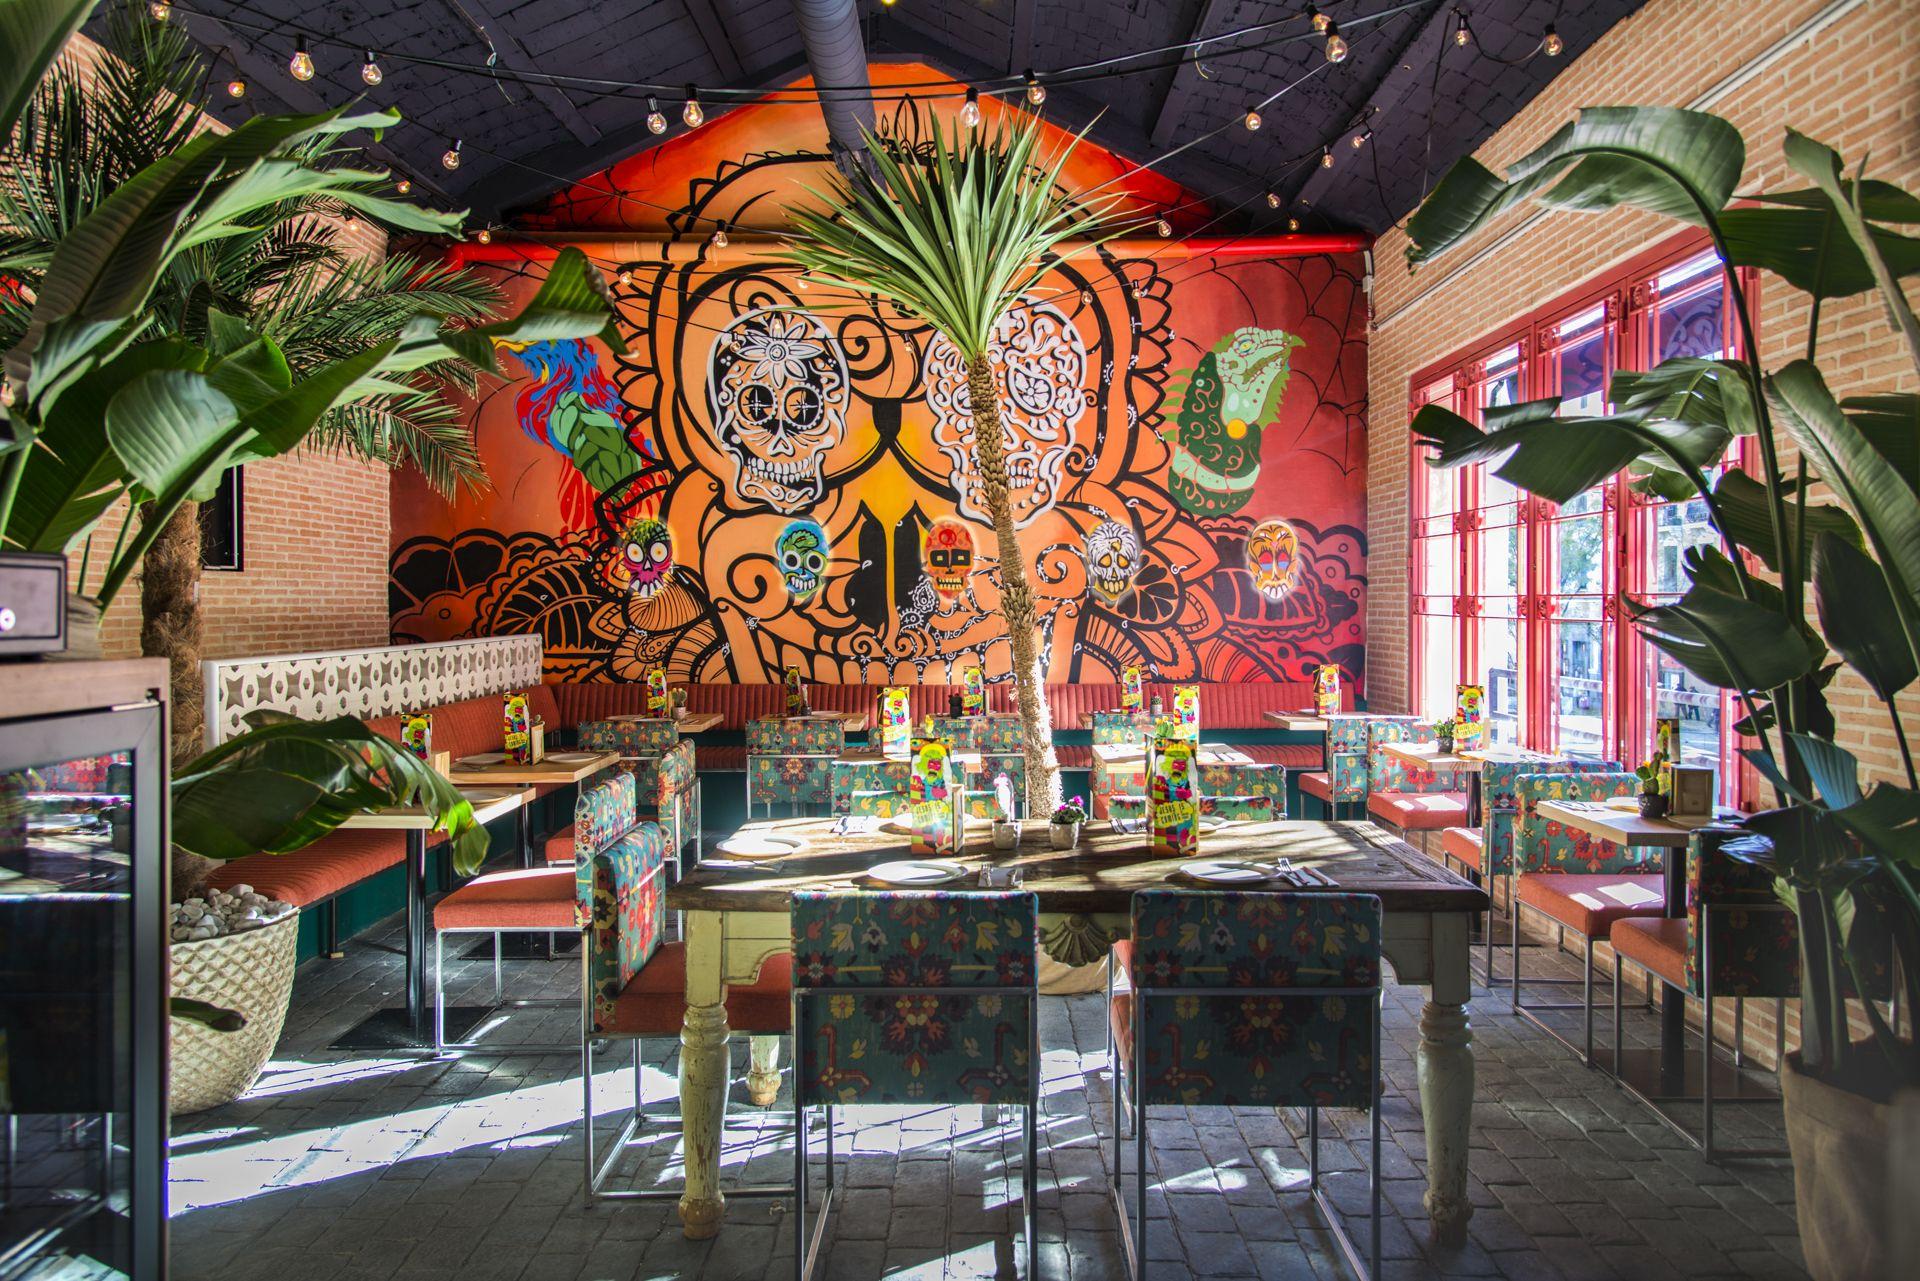 Restaurante Mexicano Restaurantes Mexicanos Decoracion Restaurantes Restaurantes